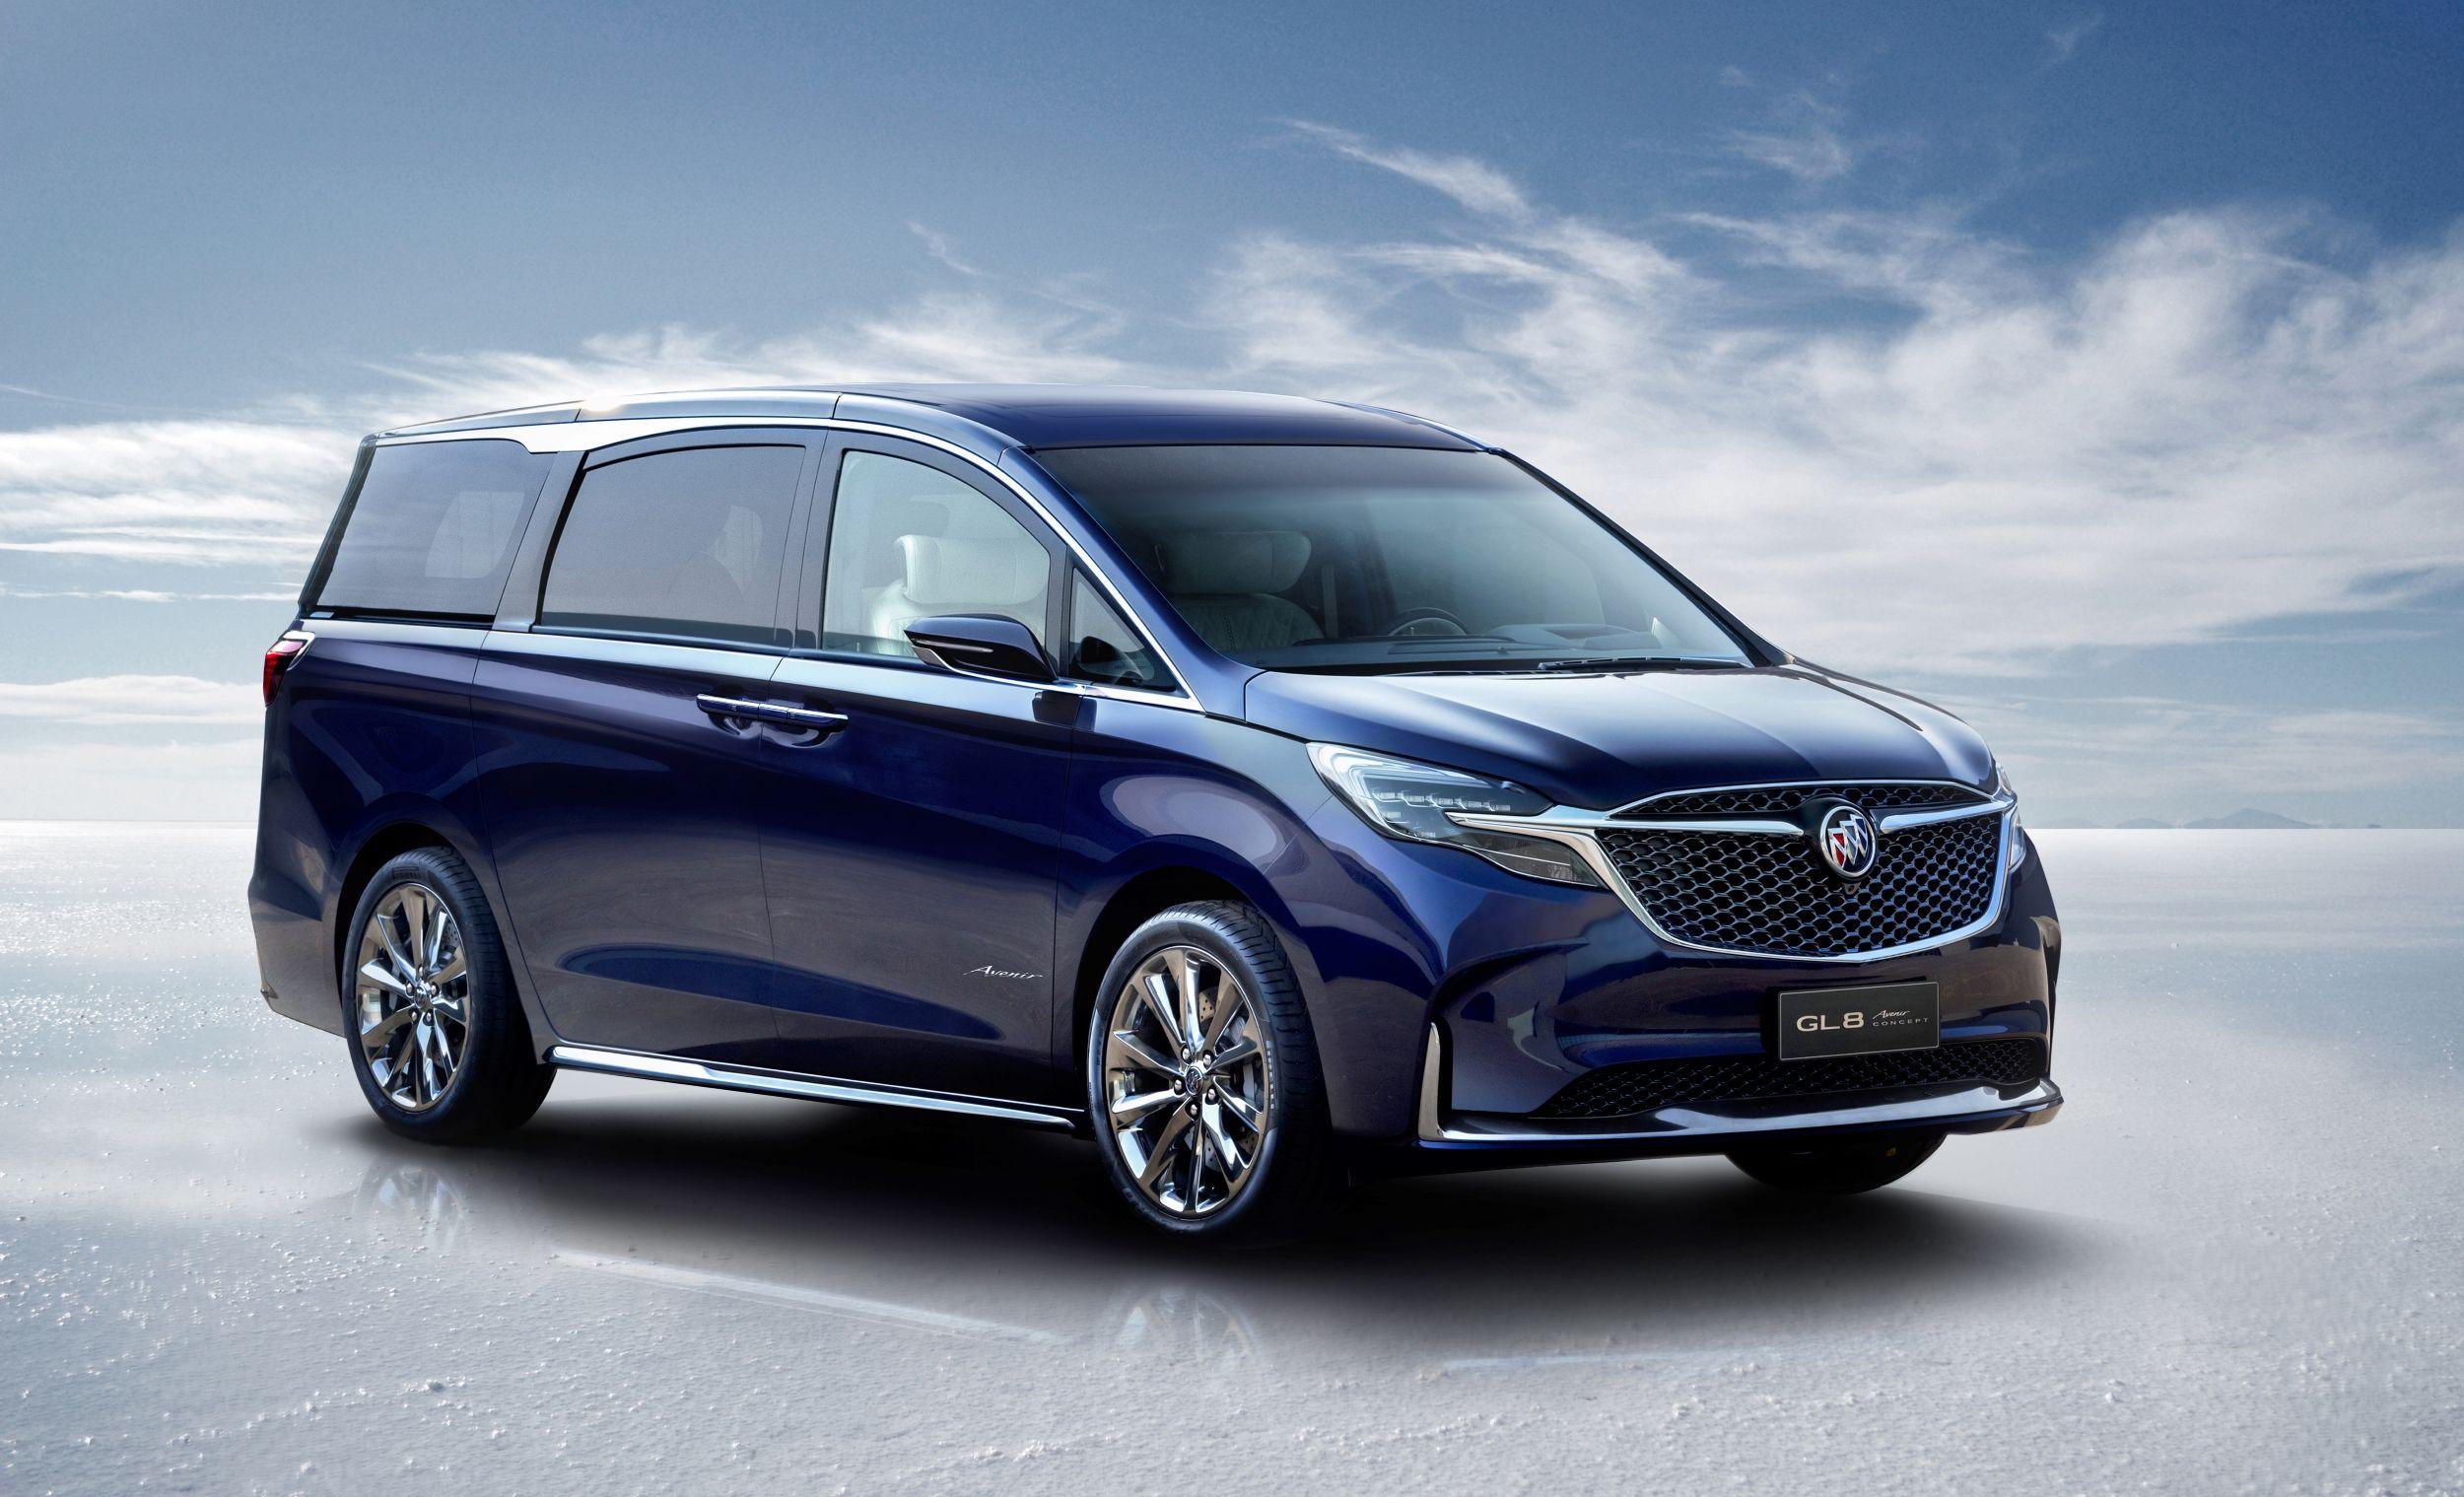 Buick Gl8 Luxury Minivan One Ups Even The Lexus Lm Details Of